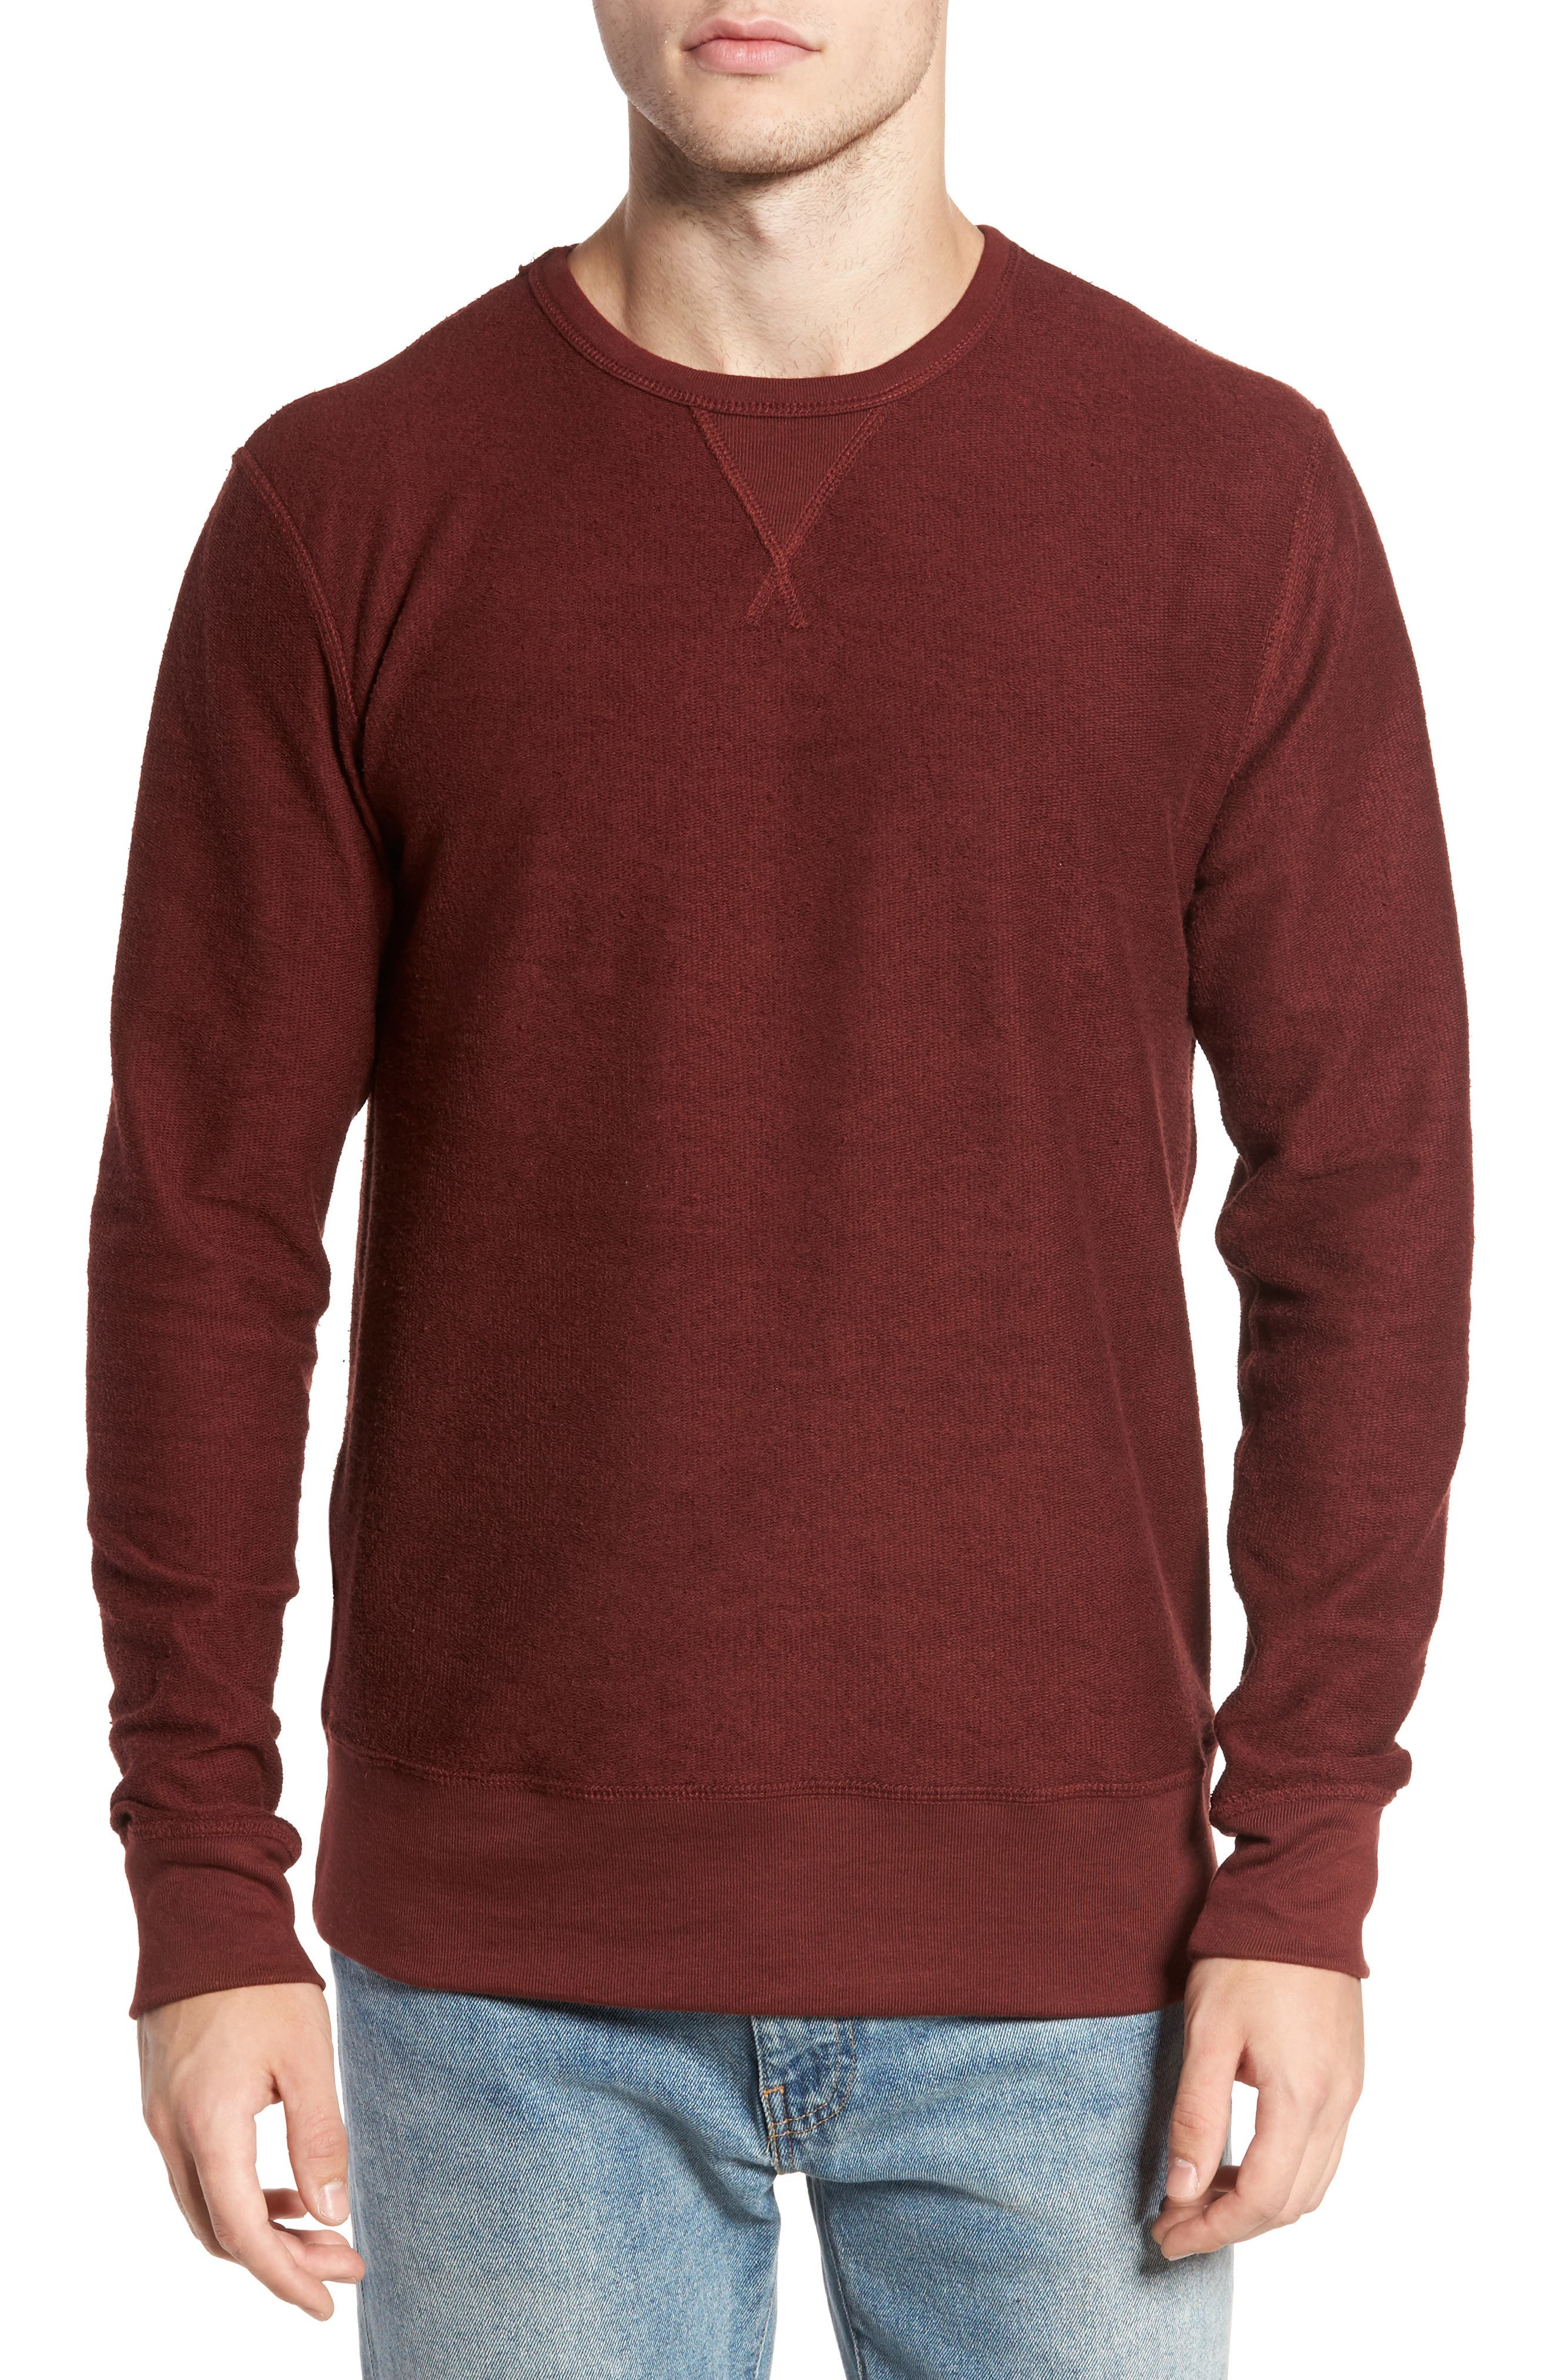 B-Side Reversible Crewneck Sweatshirt,                         Main,                         color, Maroon